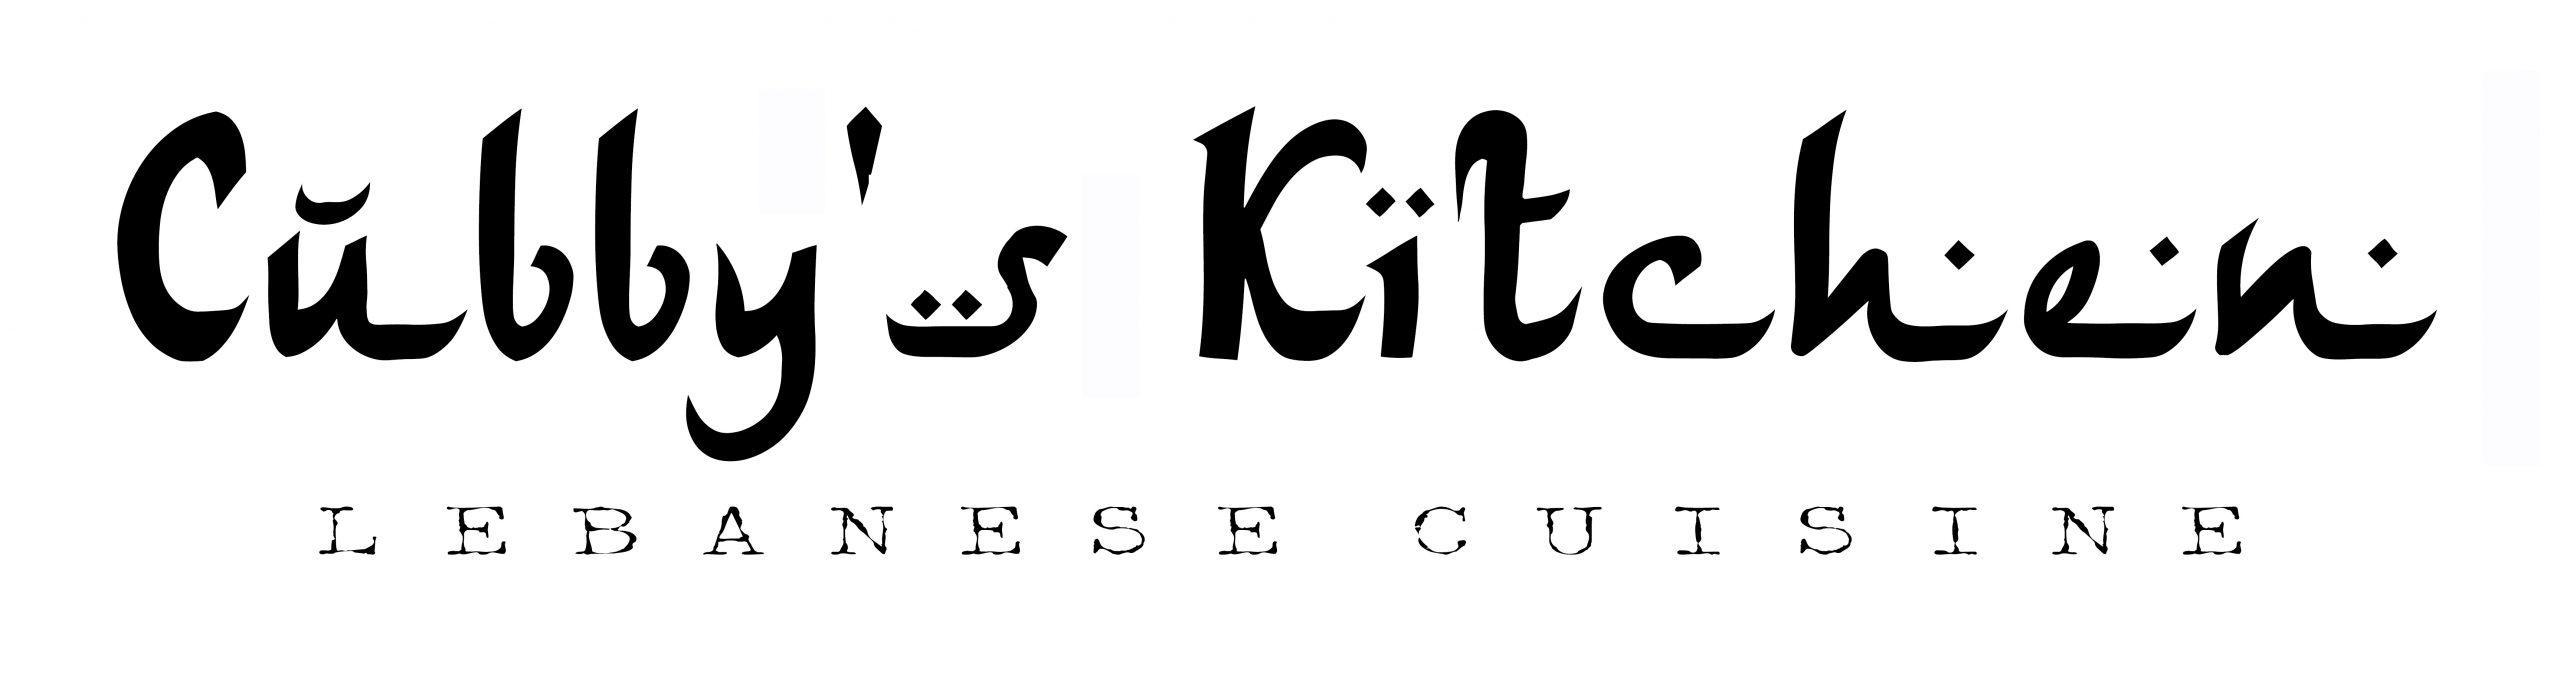 Cubby's Kitchen